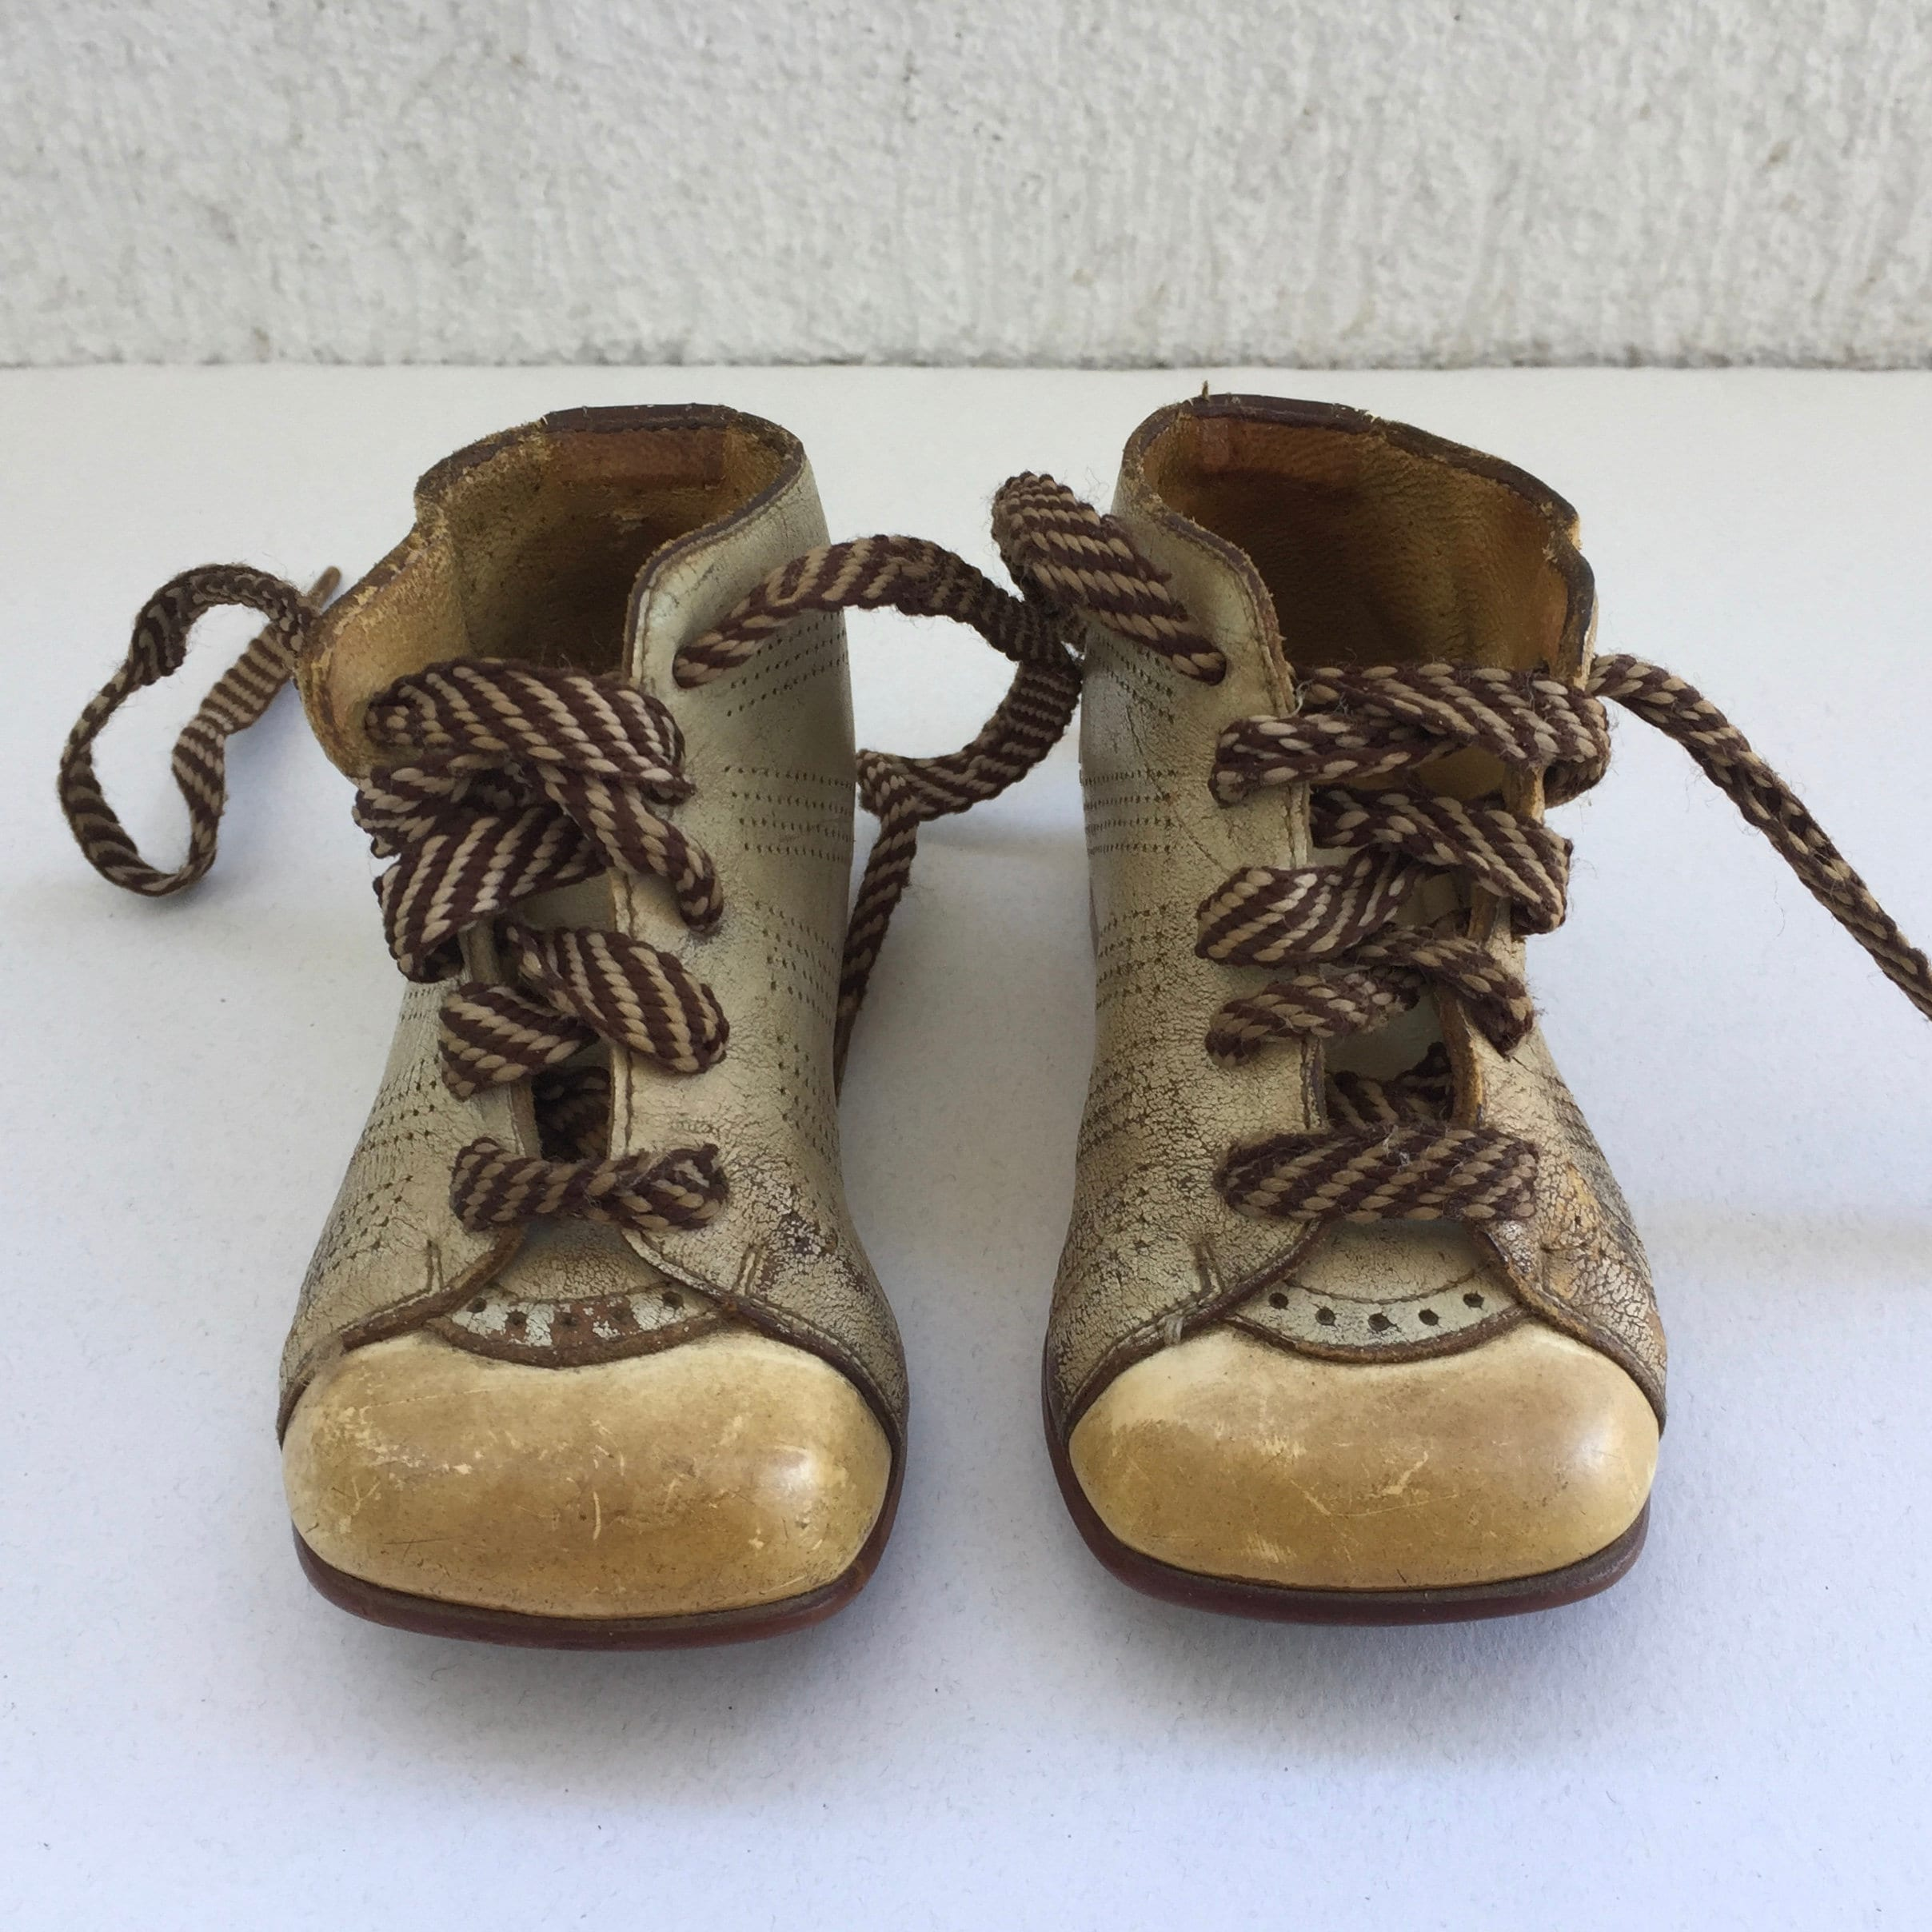 Vintage El Chico Elefanten Schuhe Eu 18 Beige Leather Baby Etsy